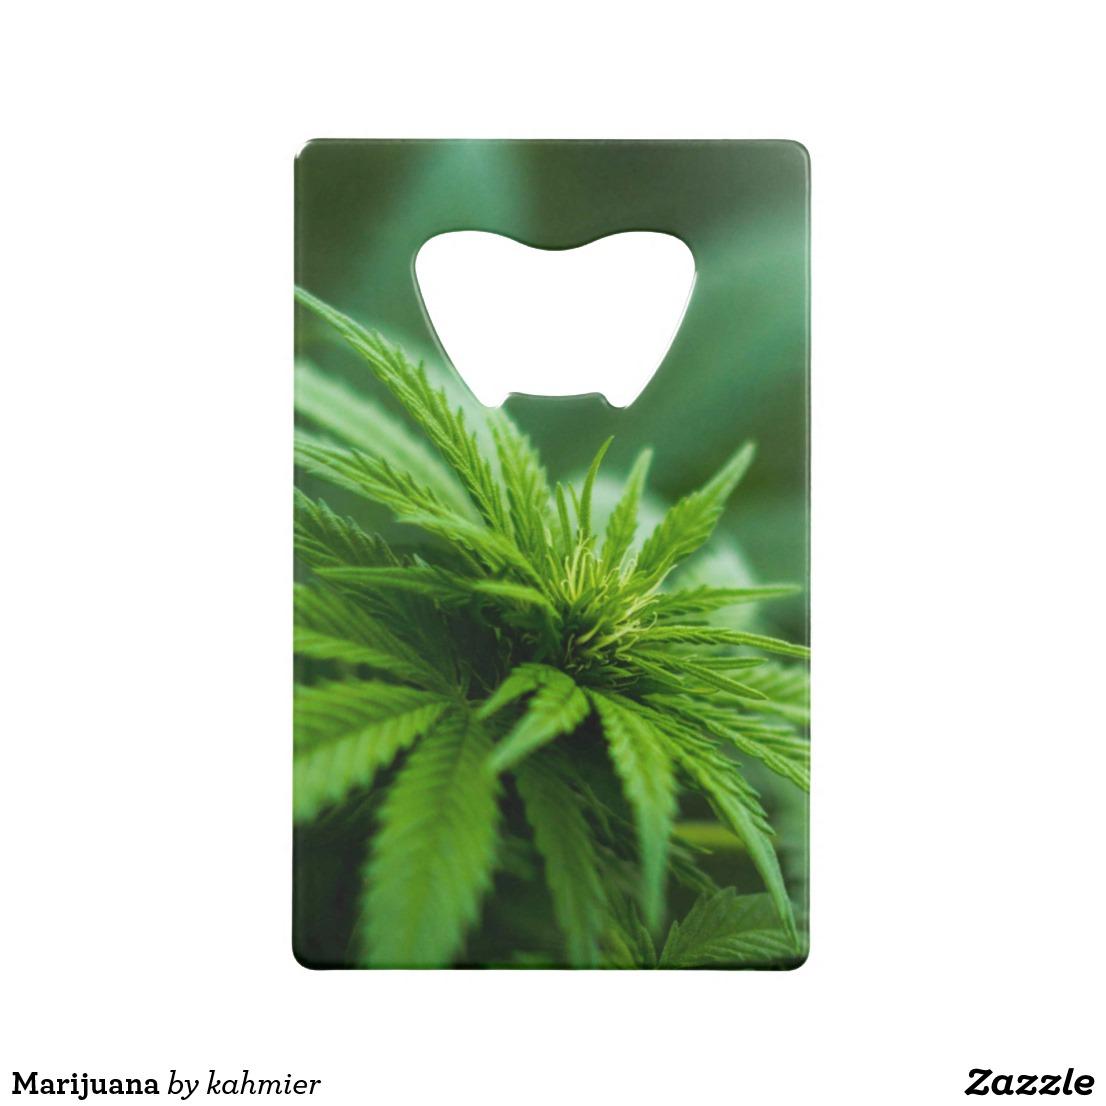 Marijuana Credit Card Bottle Opener